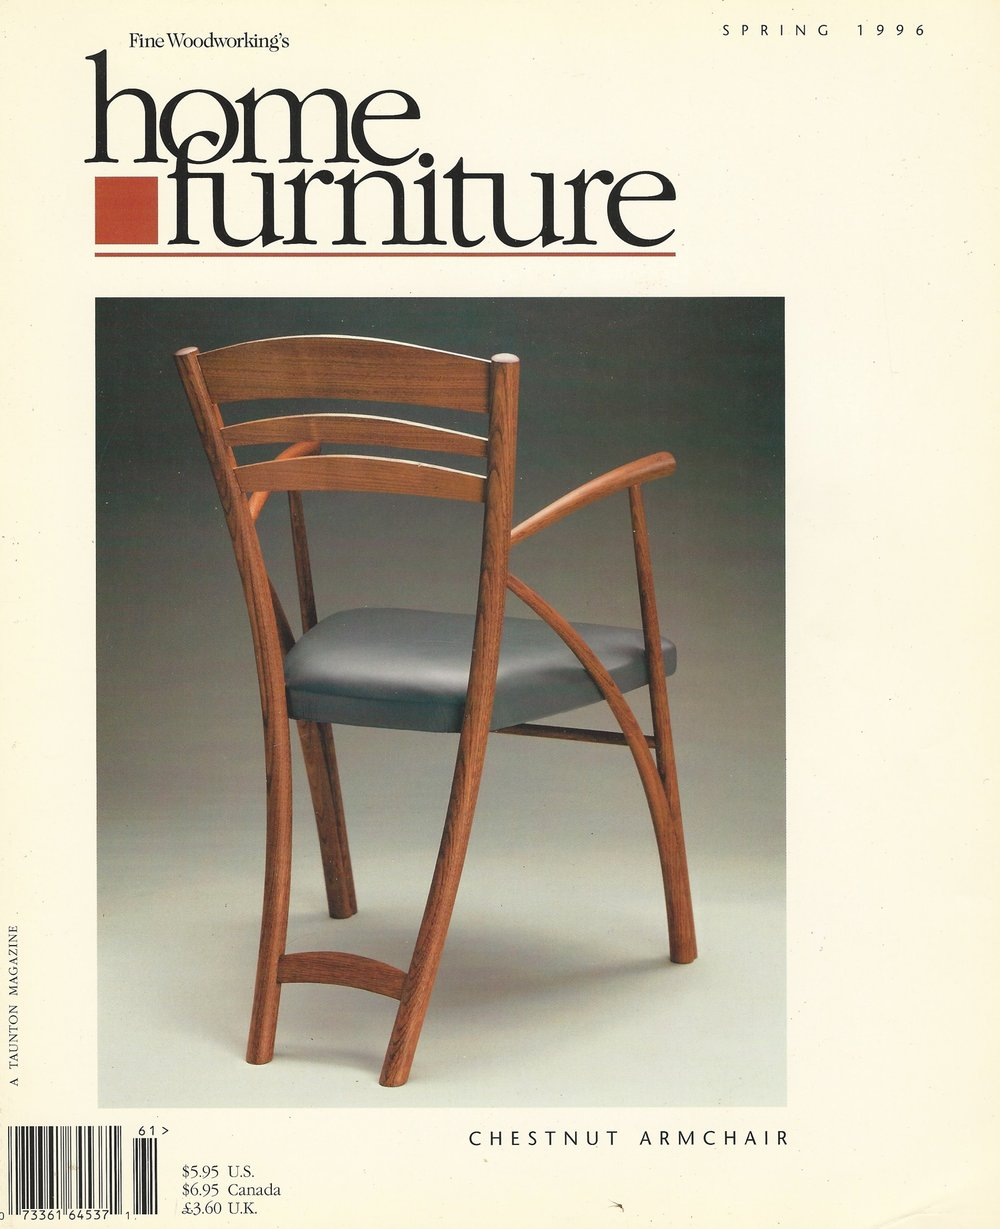 home furniture cover 1.jpg